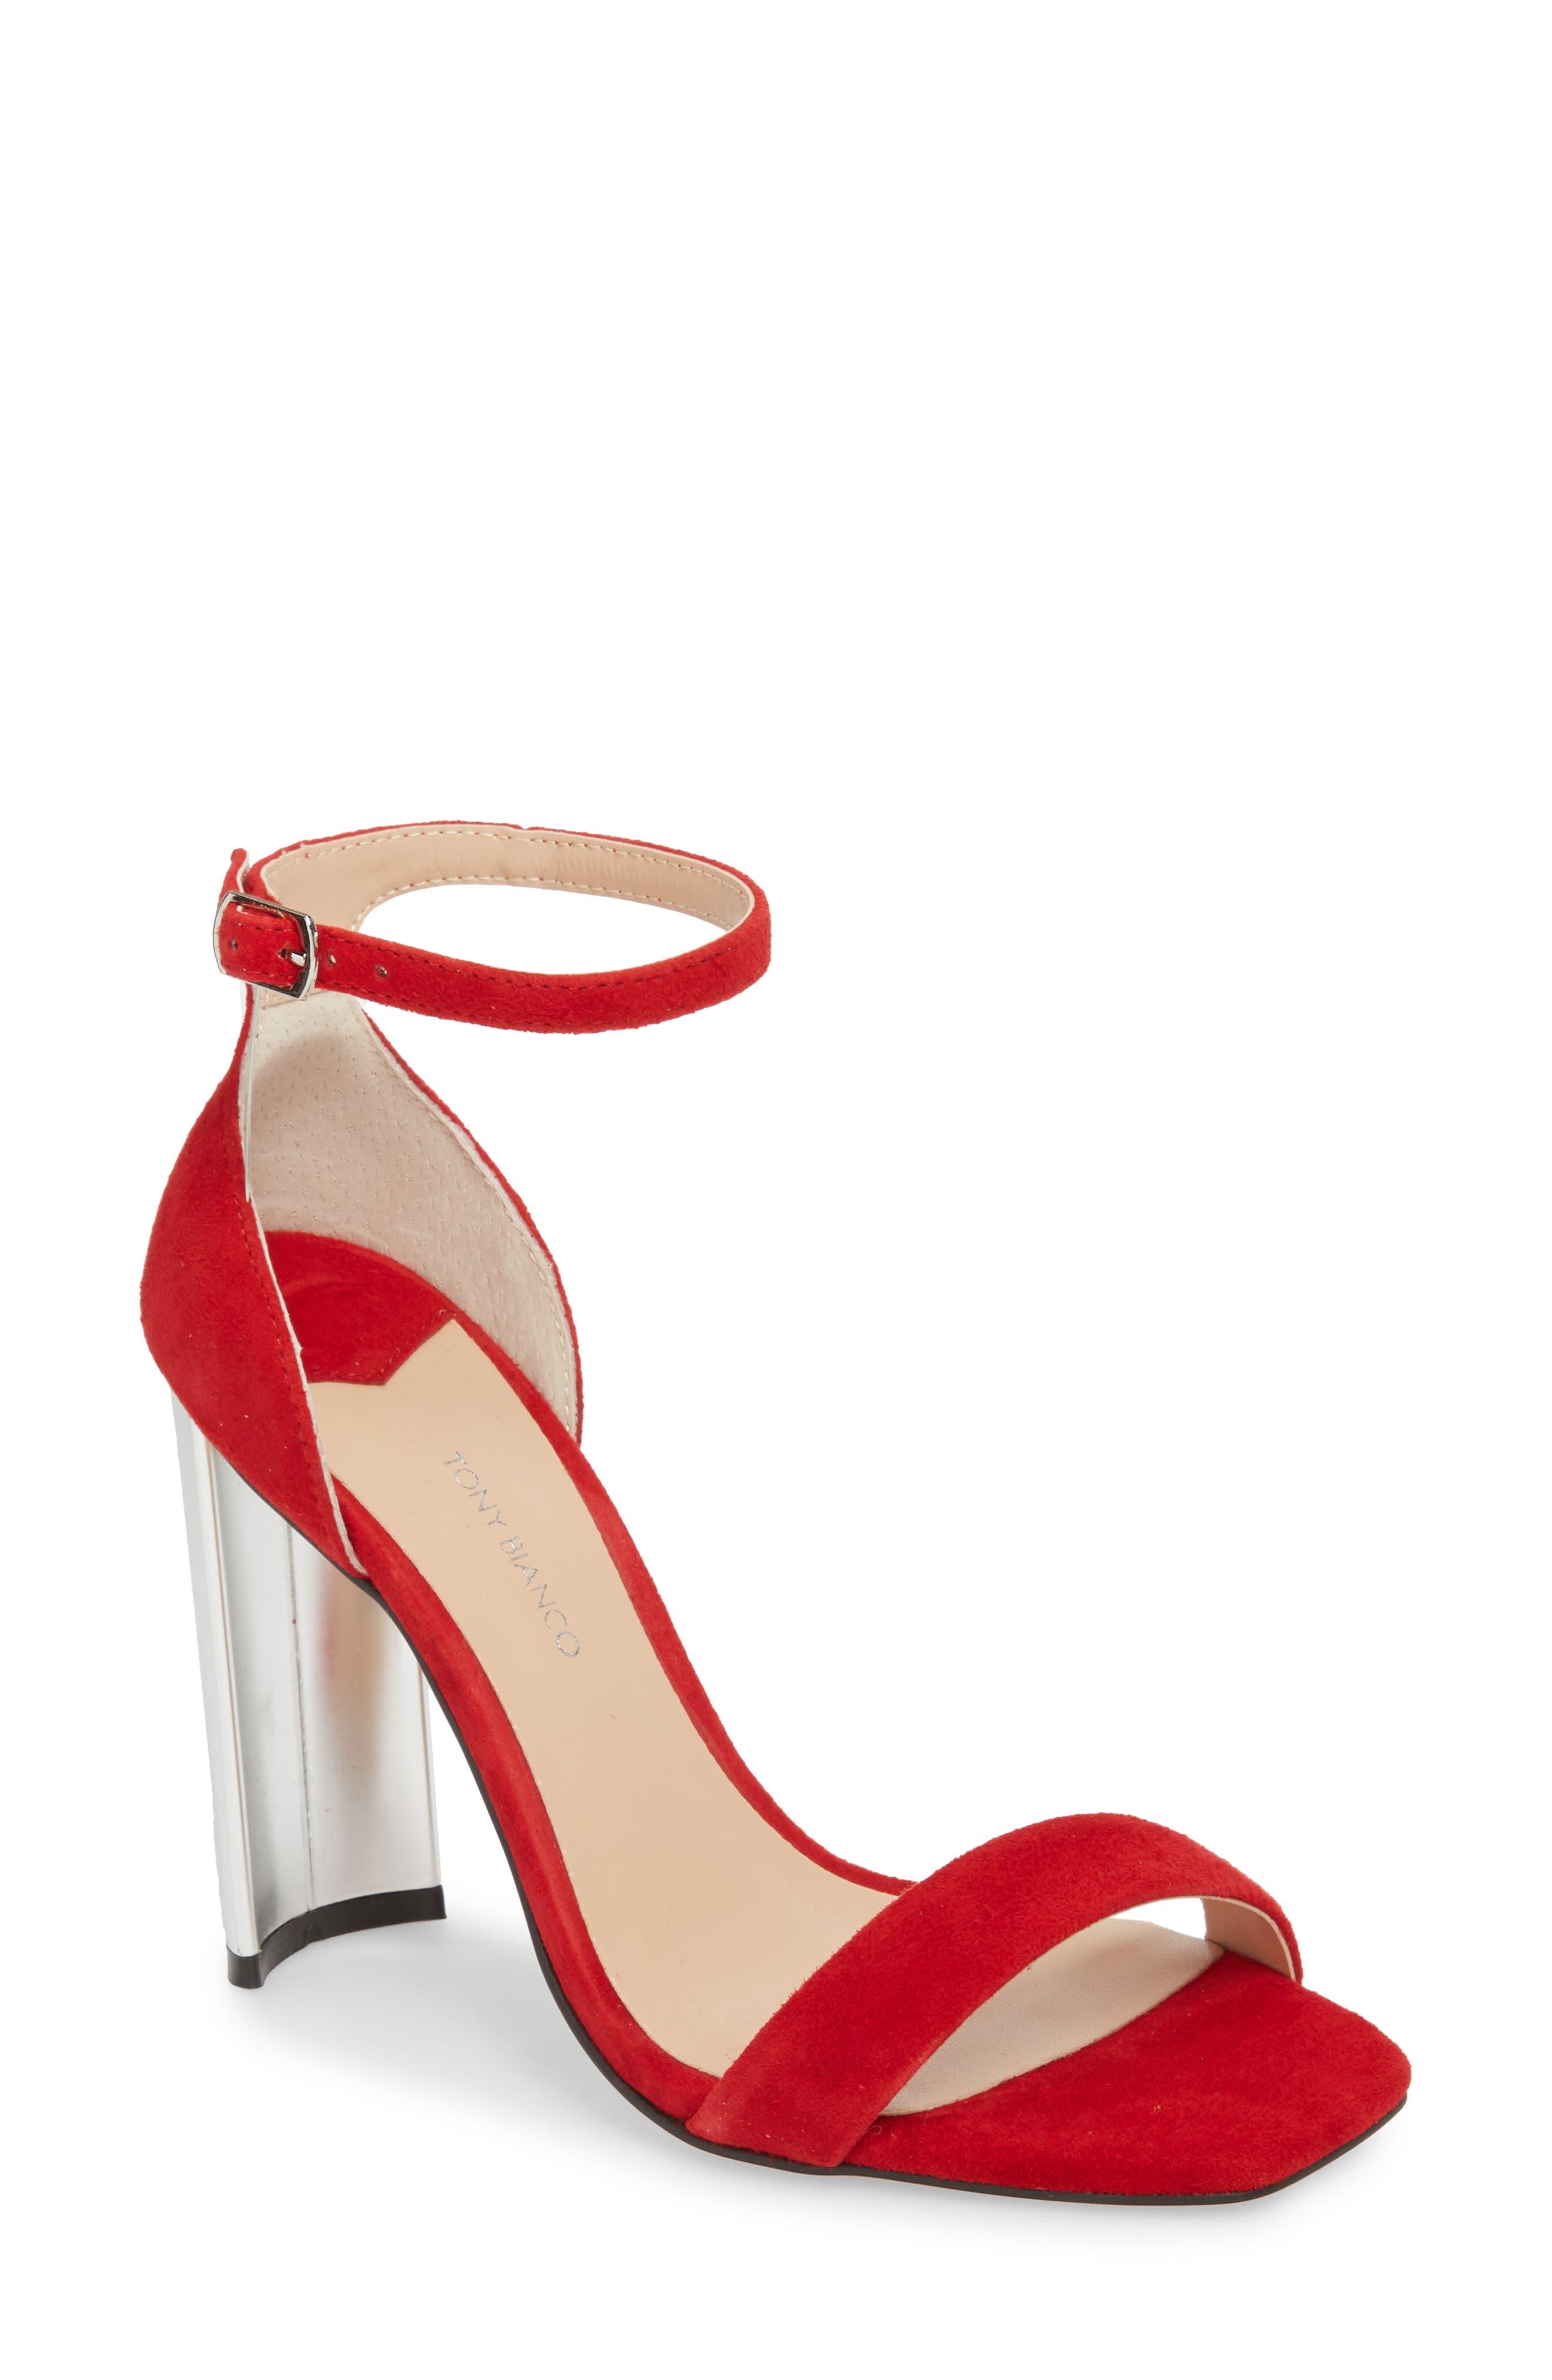 Samala Ankle Strap Sandal,                             Main thumbnail 1, color,                             Fire Suede